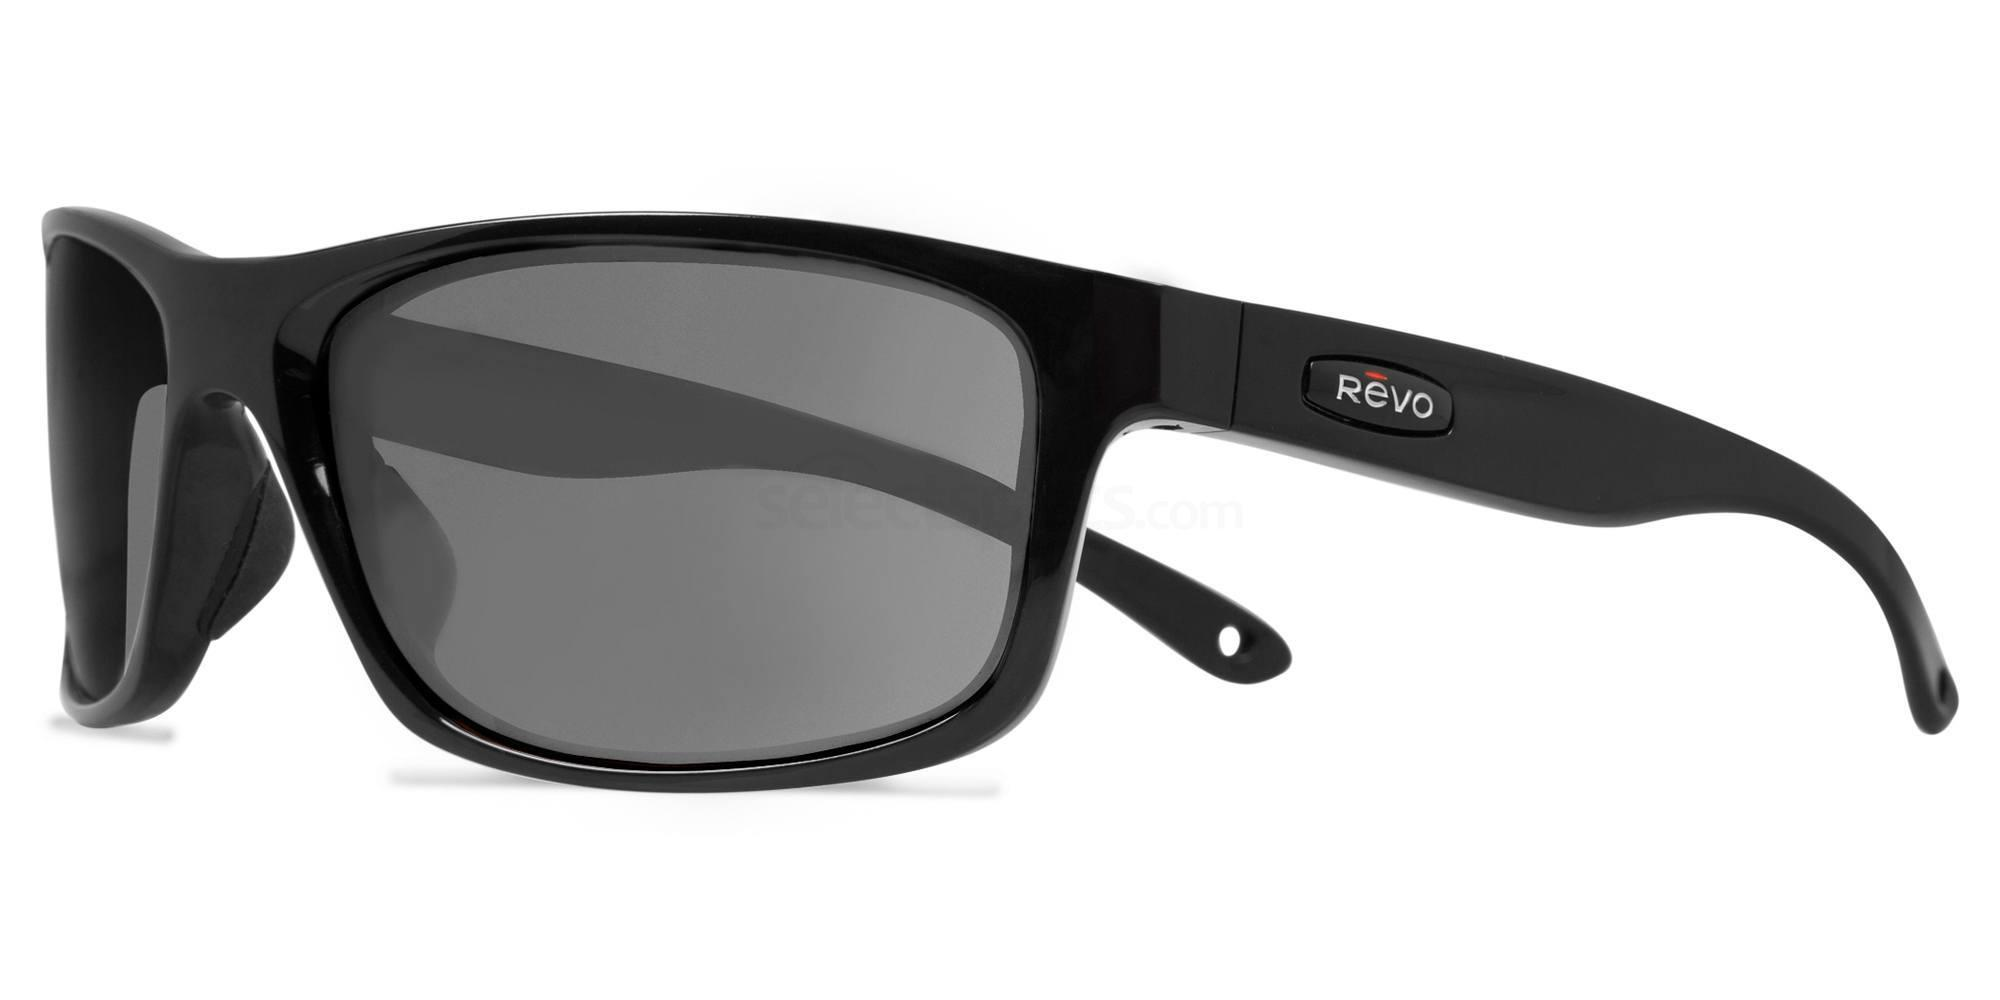 01GY Harness - 354071 Sunglasses, Revo